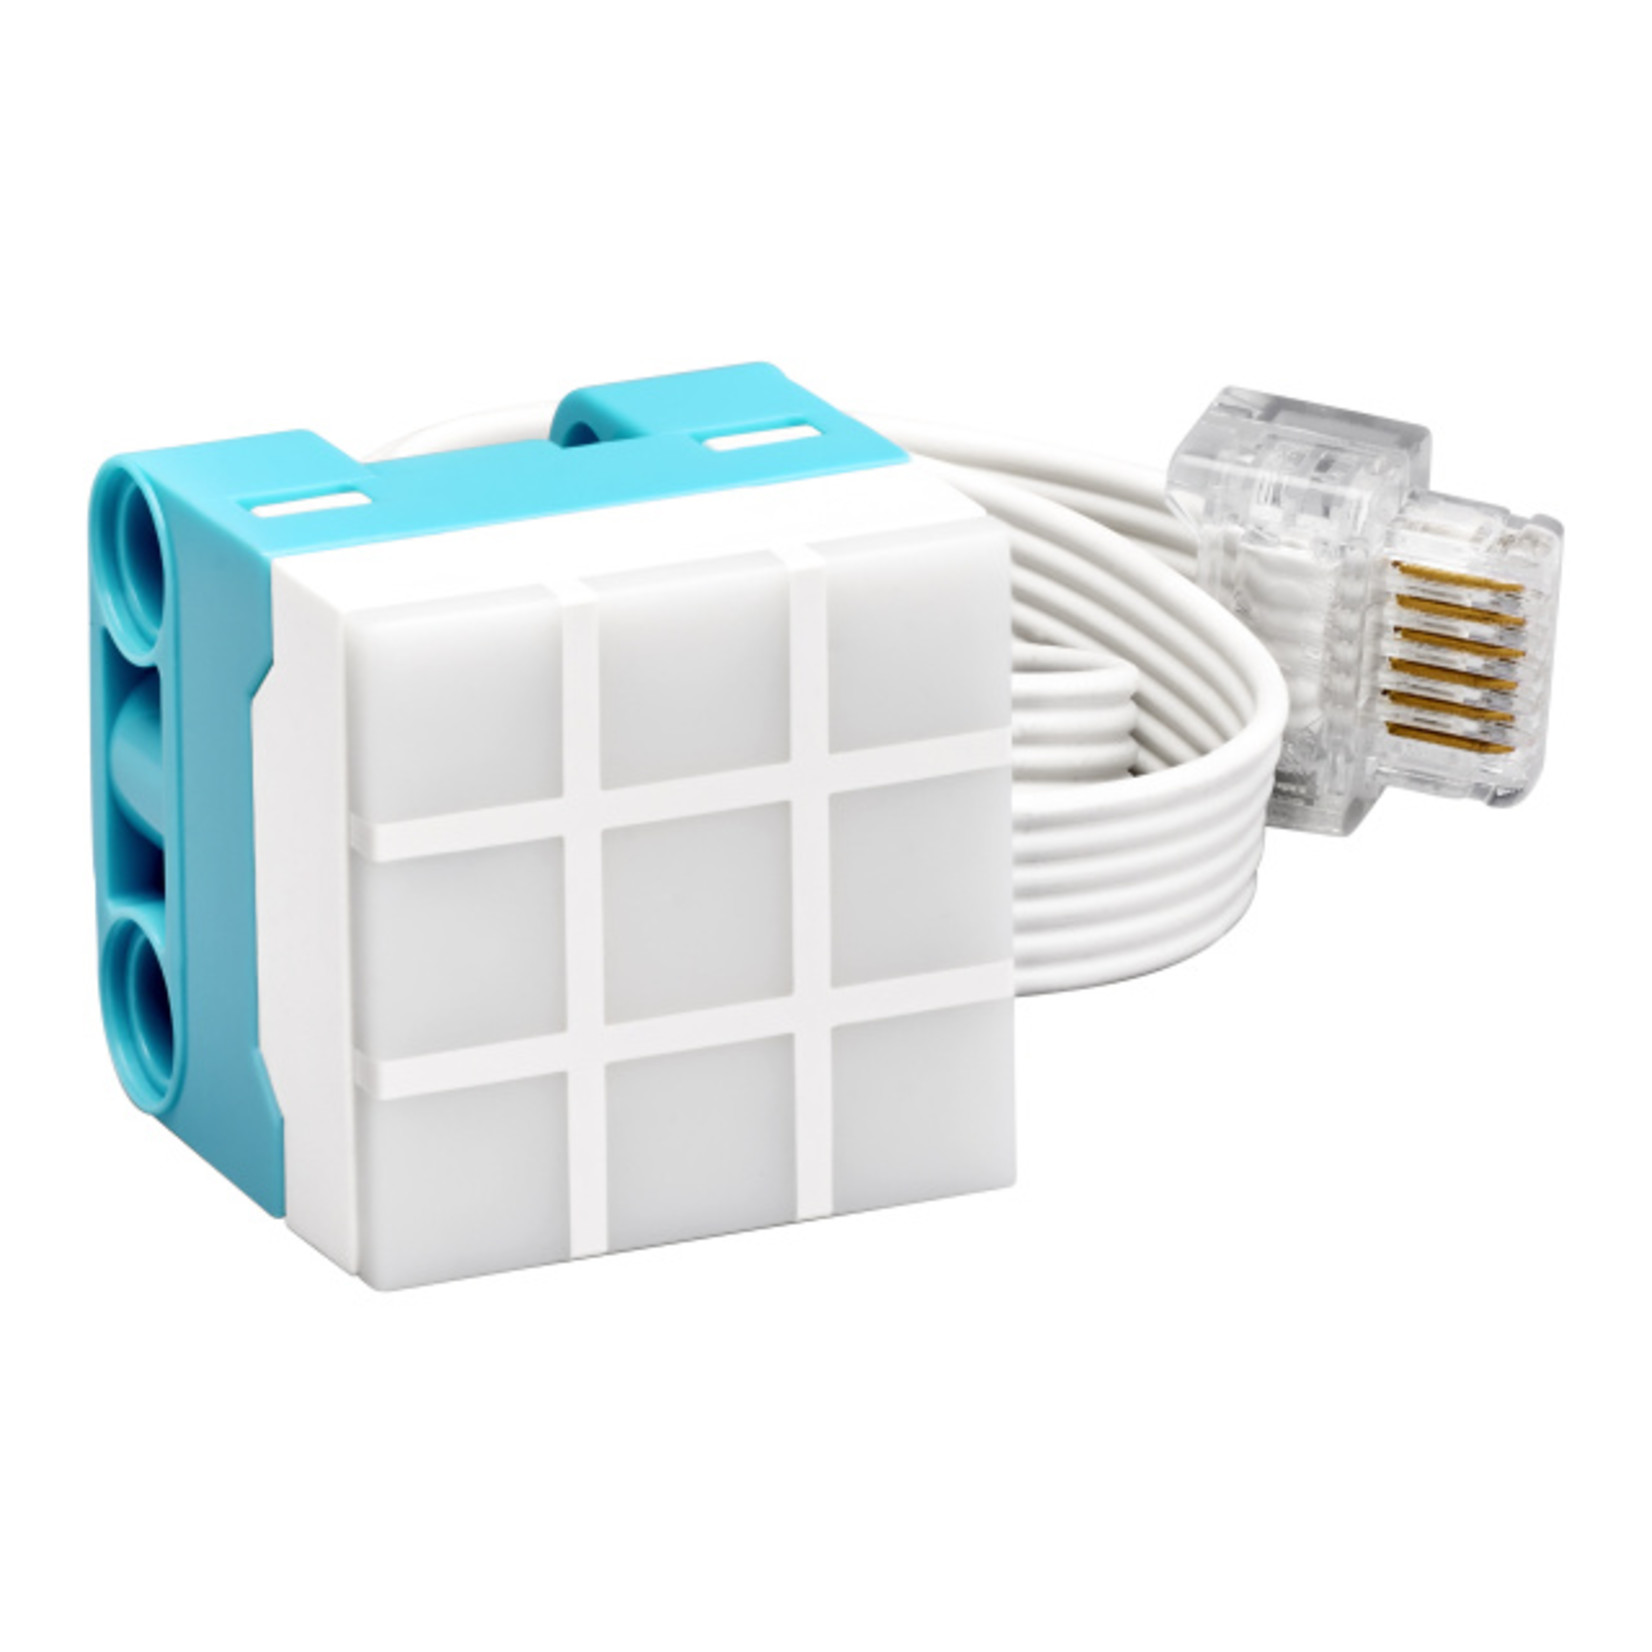 LEGO® Education TECHNIC 3x3 Color Light Matrix